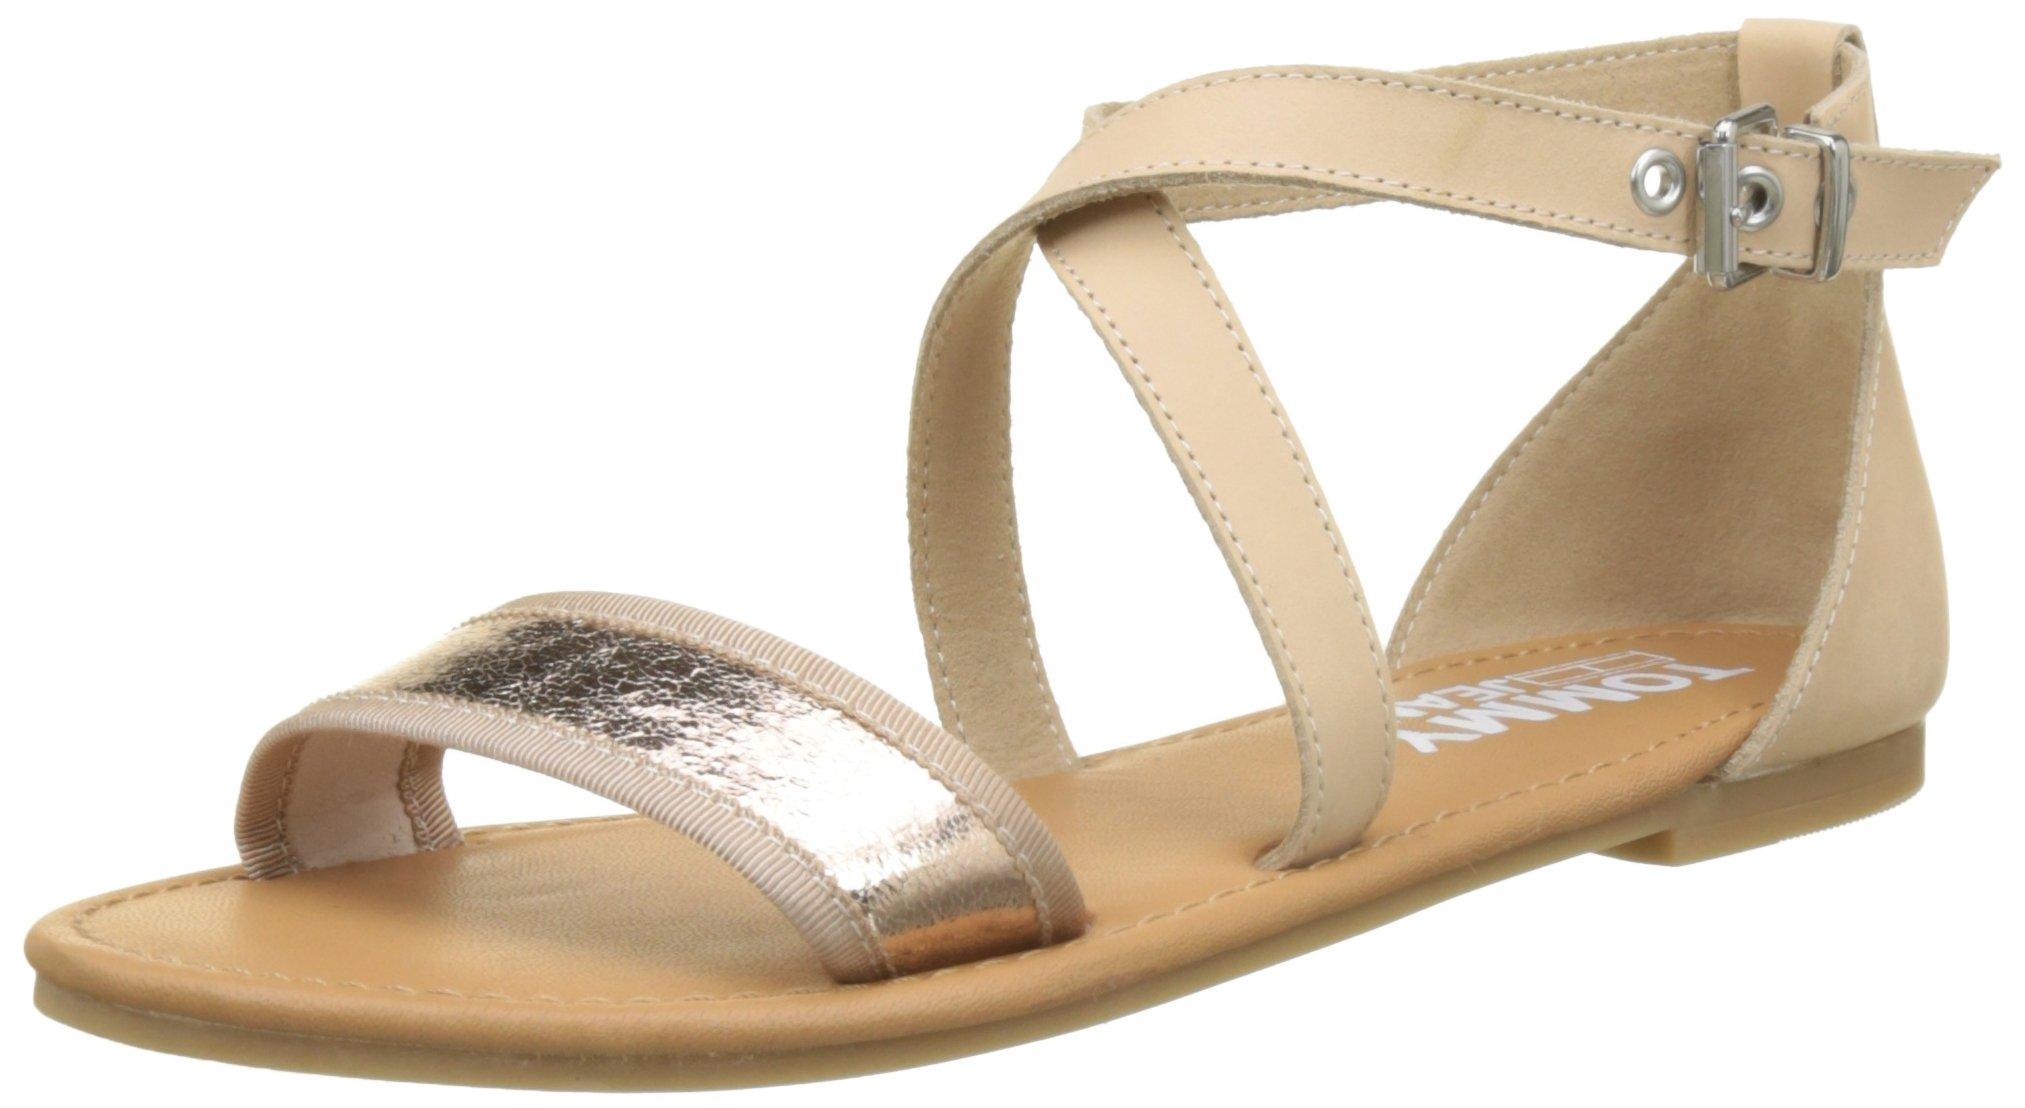 Denim Hilfiger Metallic 63839 Bride Cheville Femmerose Gold Jeans FlatSandales Tommy Eu UpSzVMGq